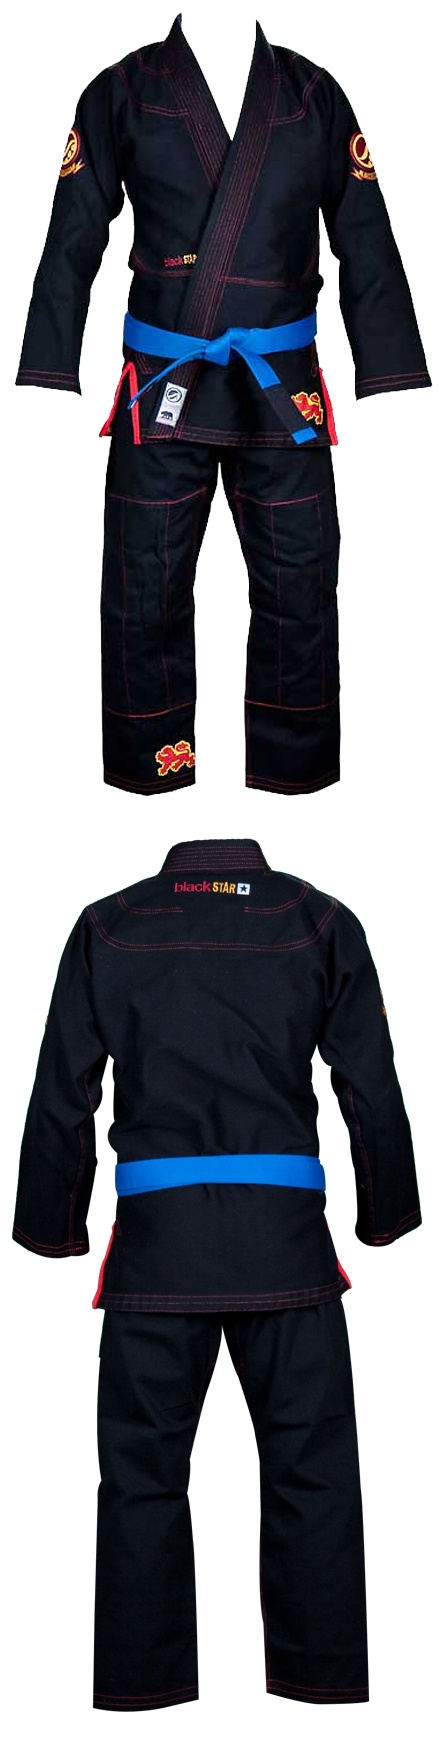 Shoyoroll Brand Limited Edition Black Star BJJ Kimono